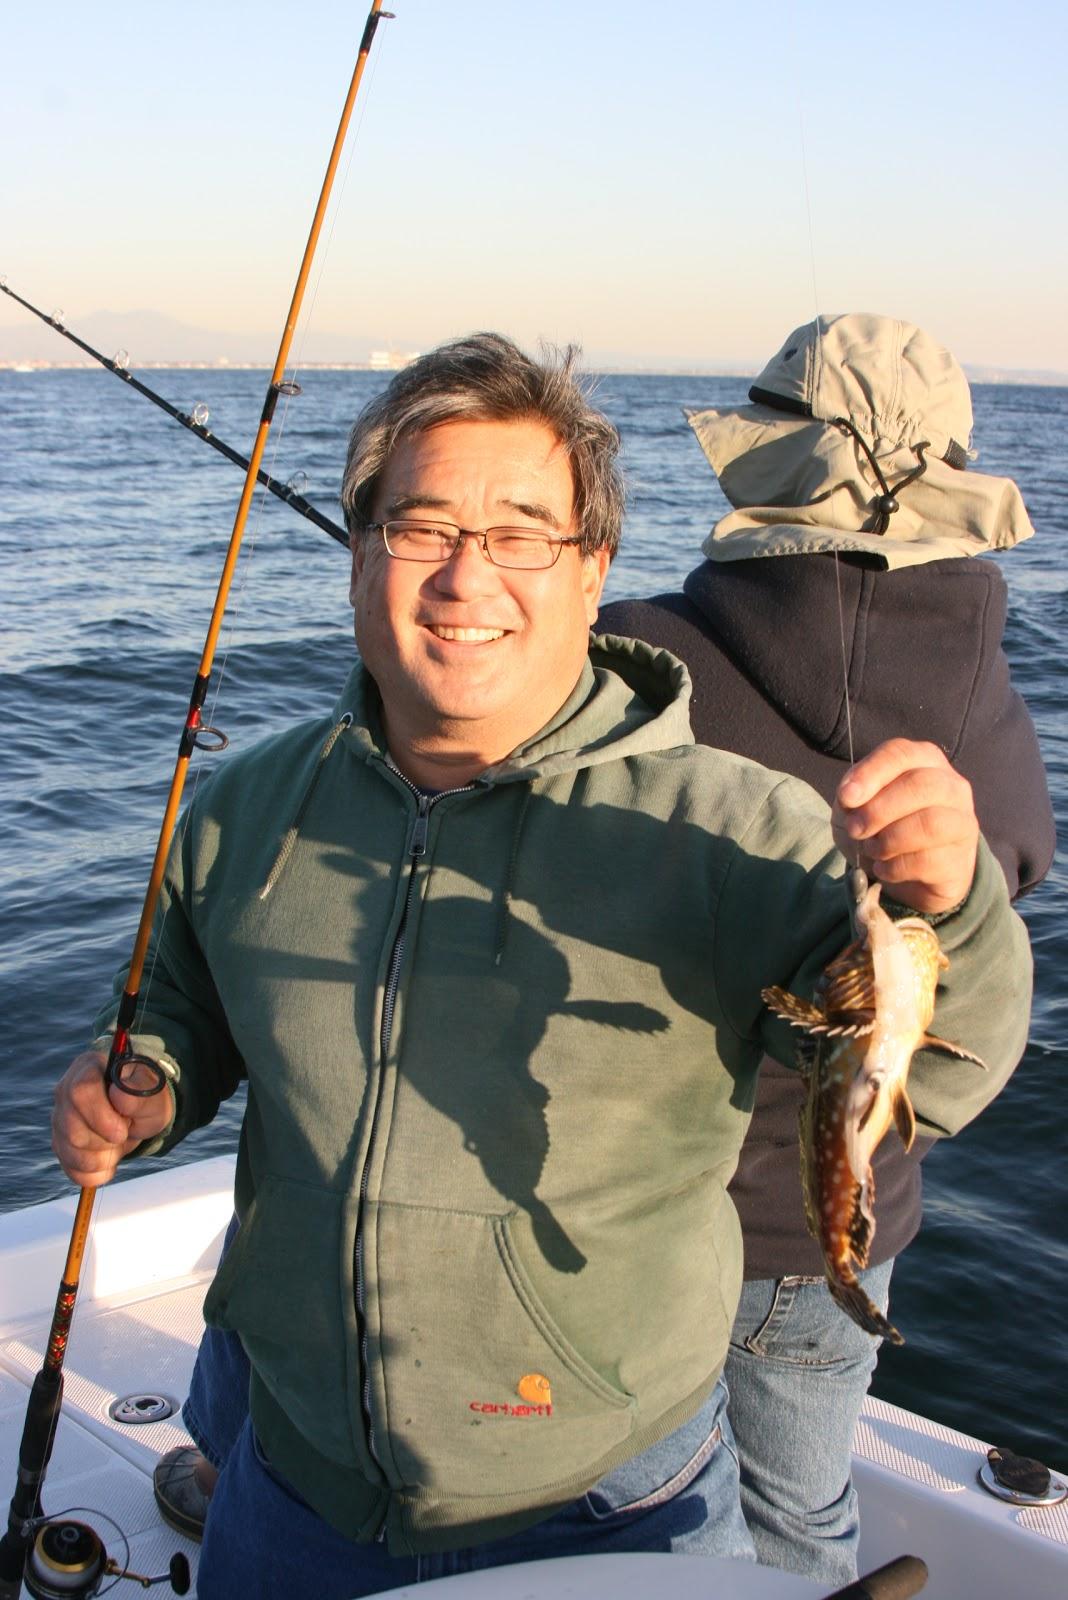 Dan 39 S Journal Combo Fishing Lobster Report For 12 06